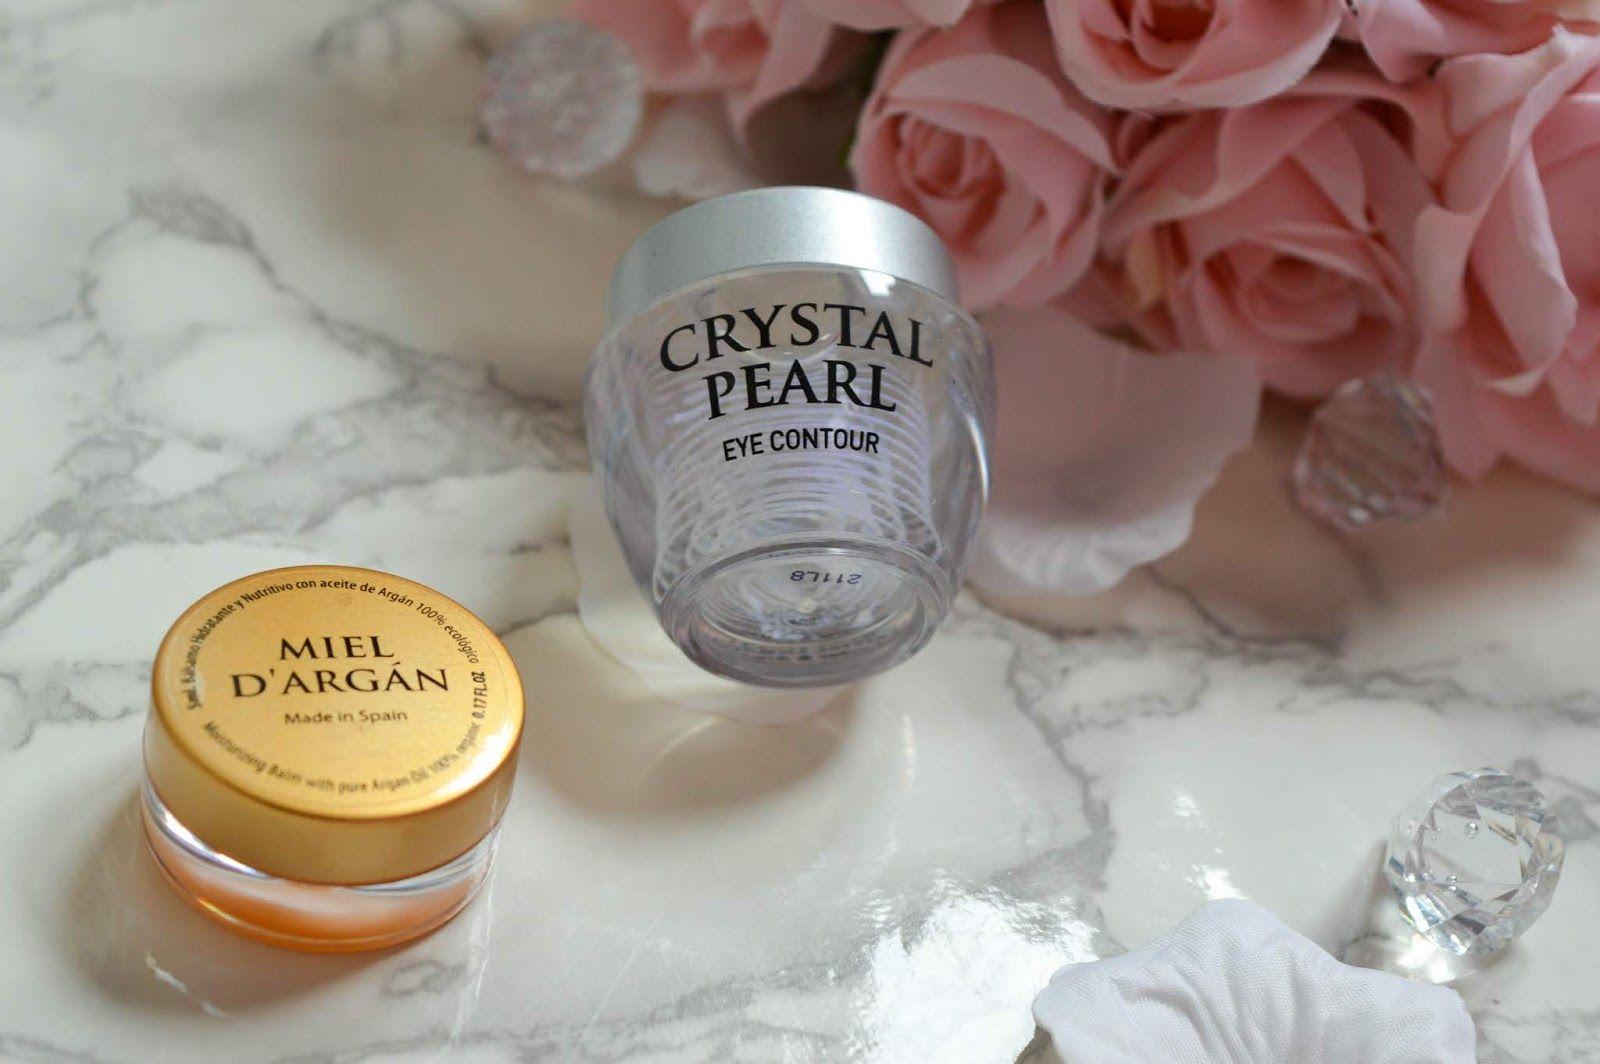 Crystal Pearl Eye Contour Gel